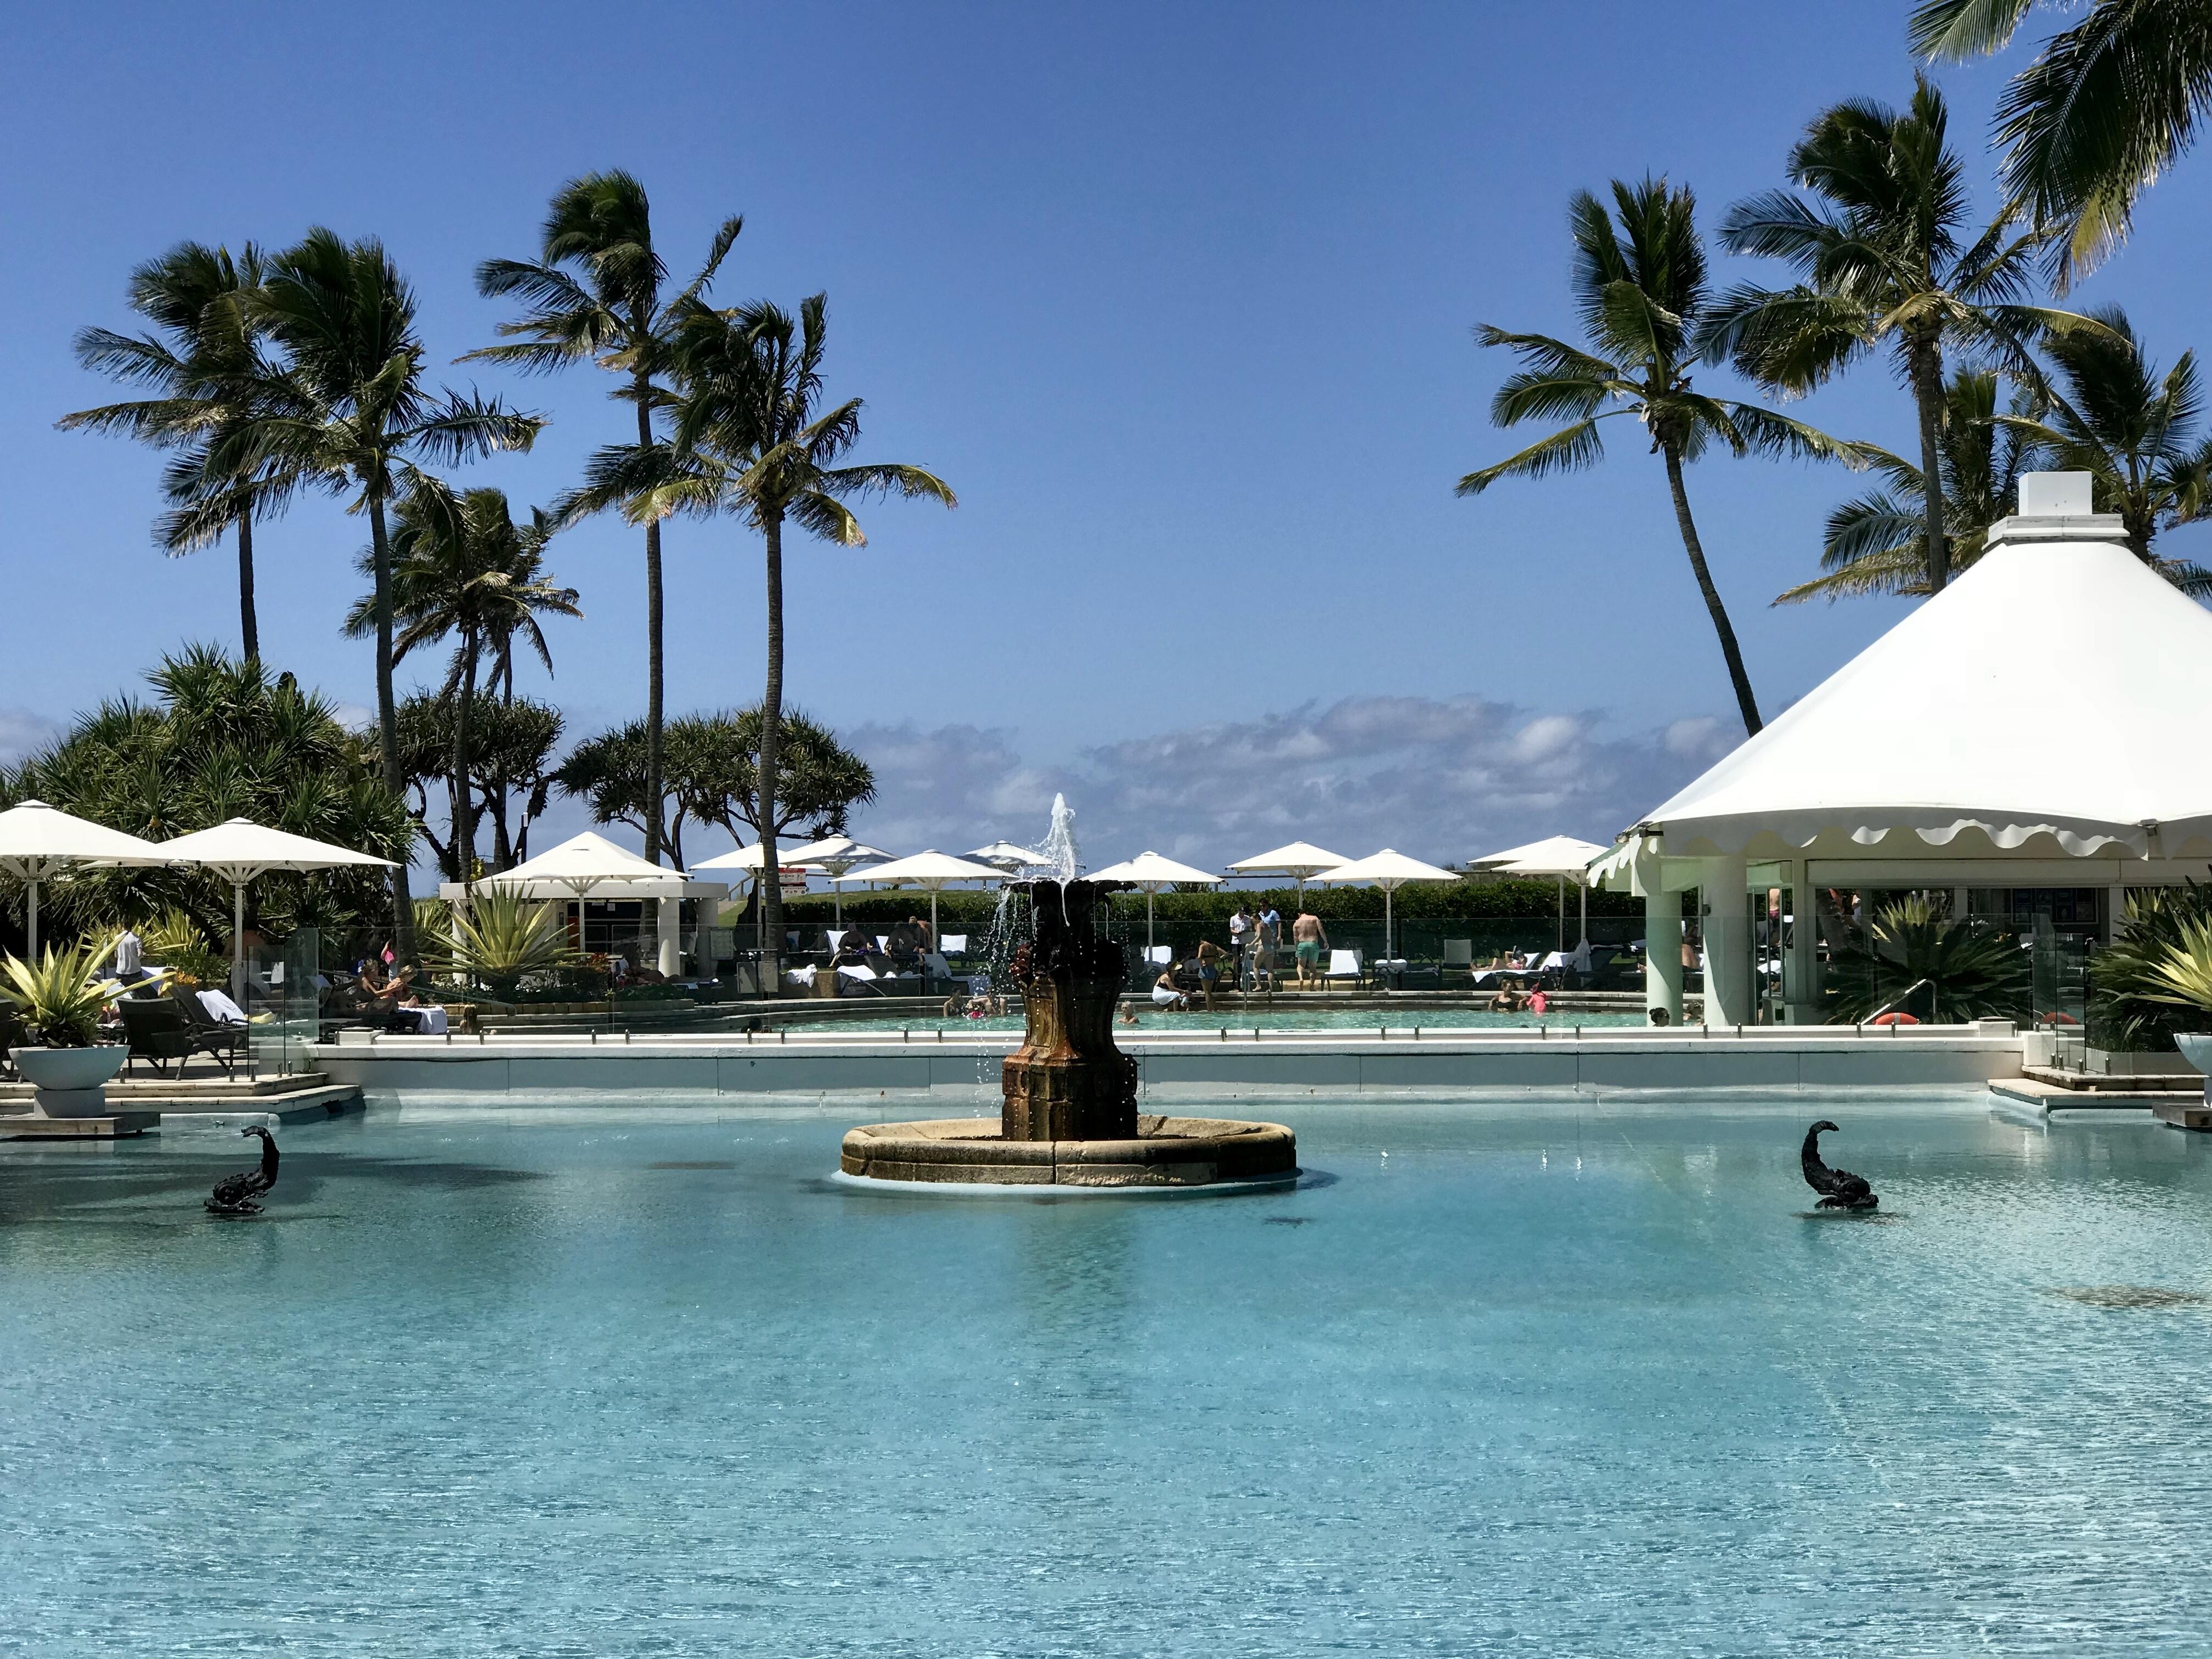 File:Palm garden and ornamental pools around Sheraton Grand